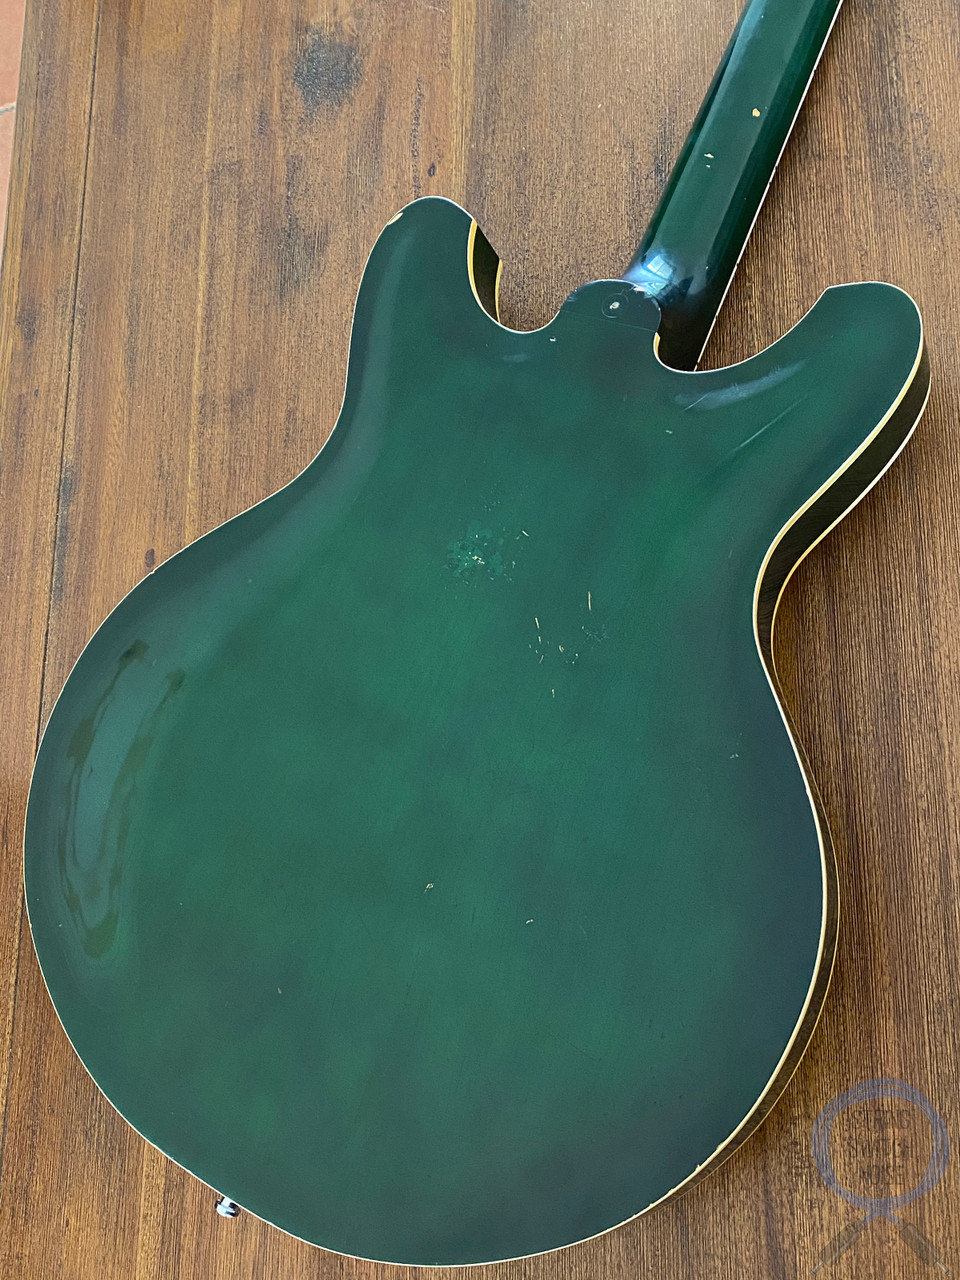 Yamaha, Vintage Hollow Body, Tremolo, 1973, Transparent Green, SA30T